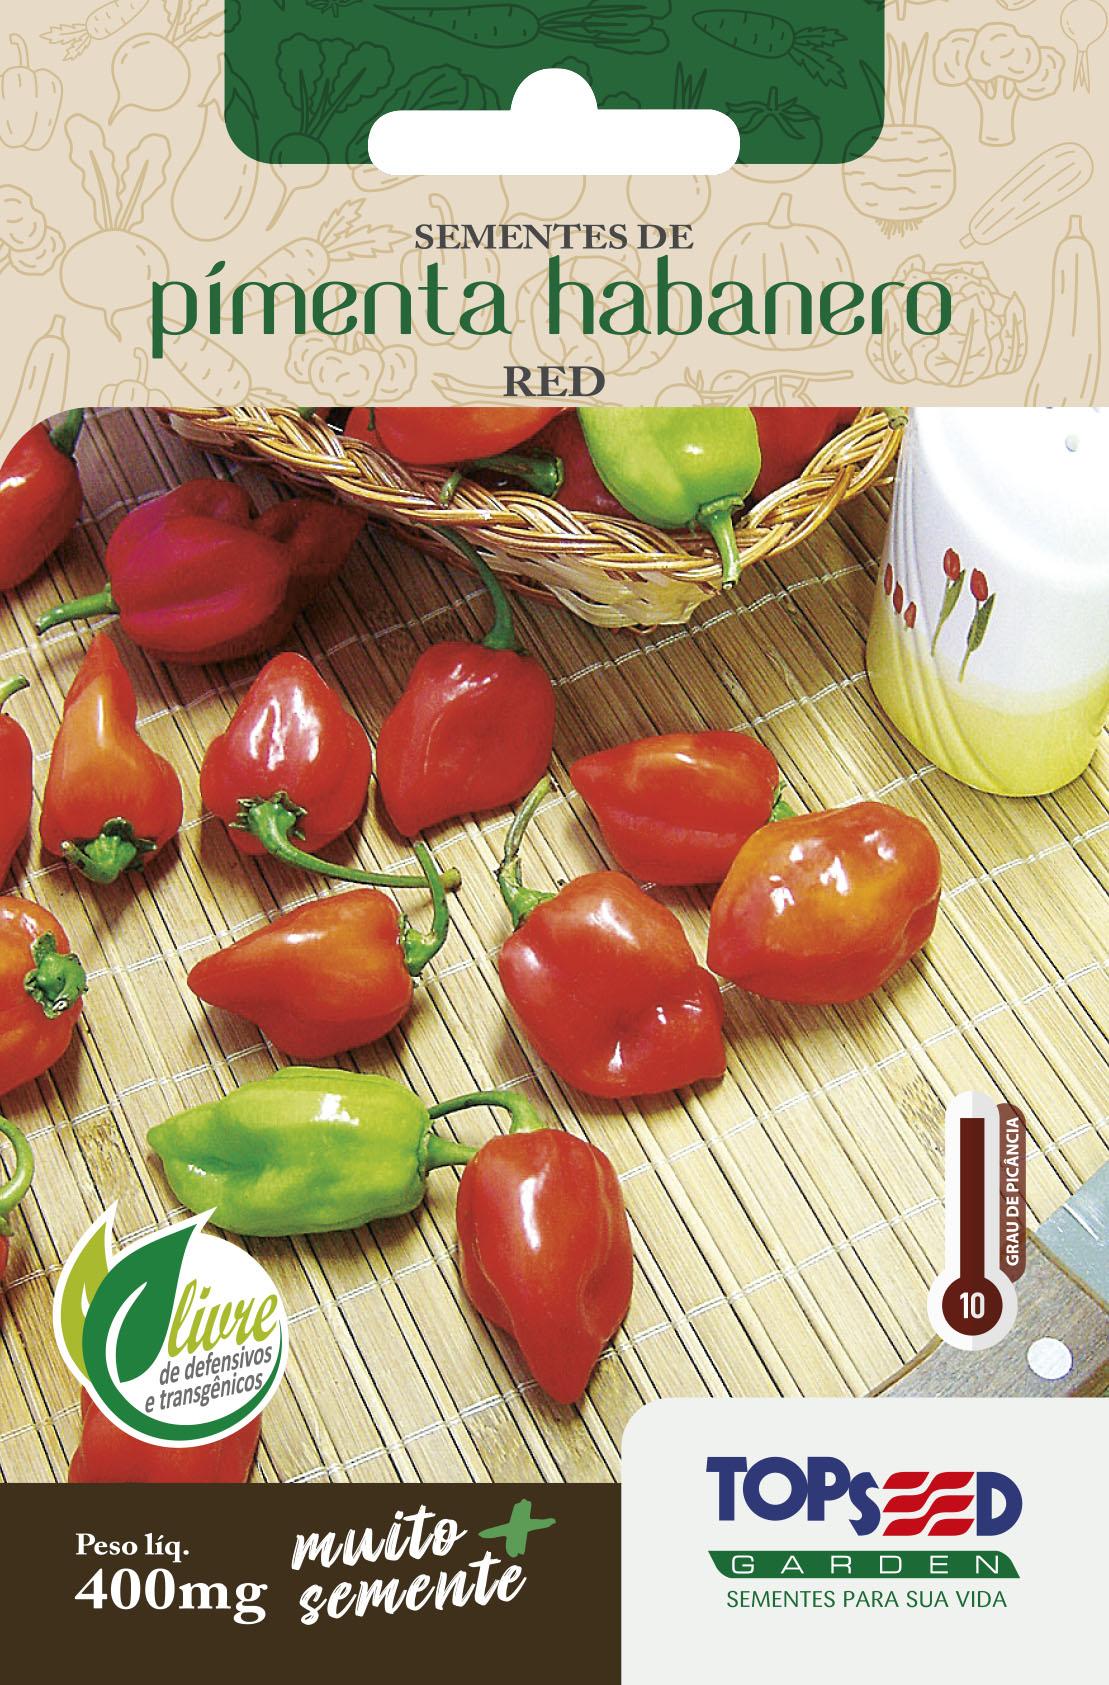 PIMENTA HABANERO RED